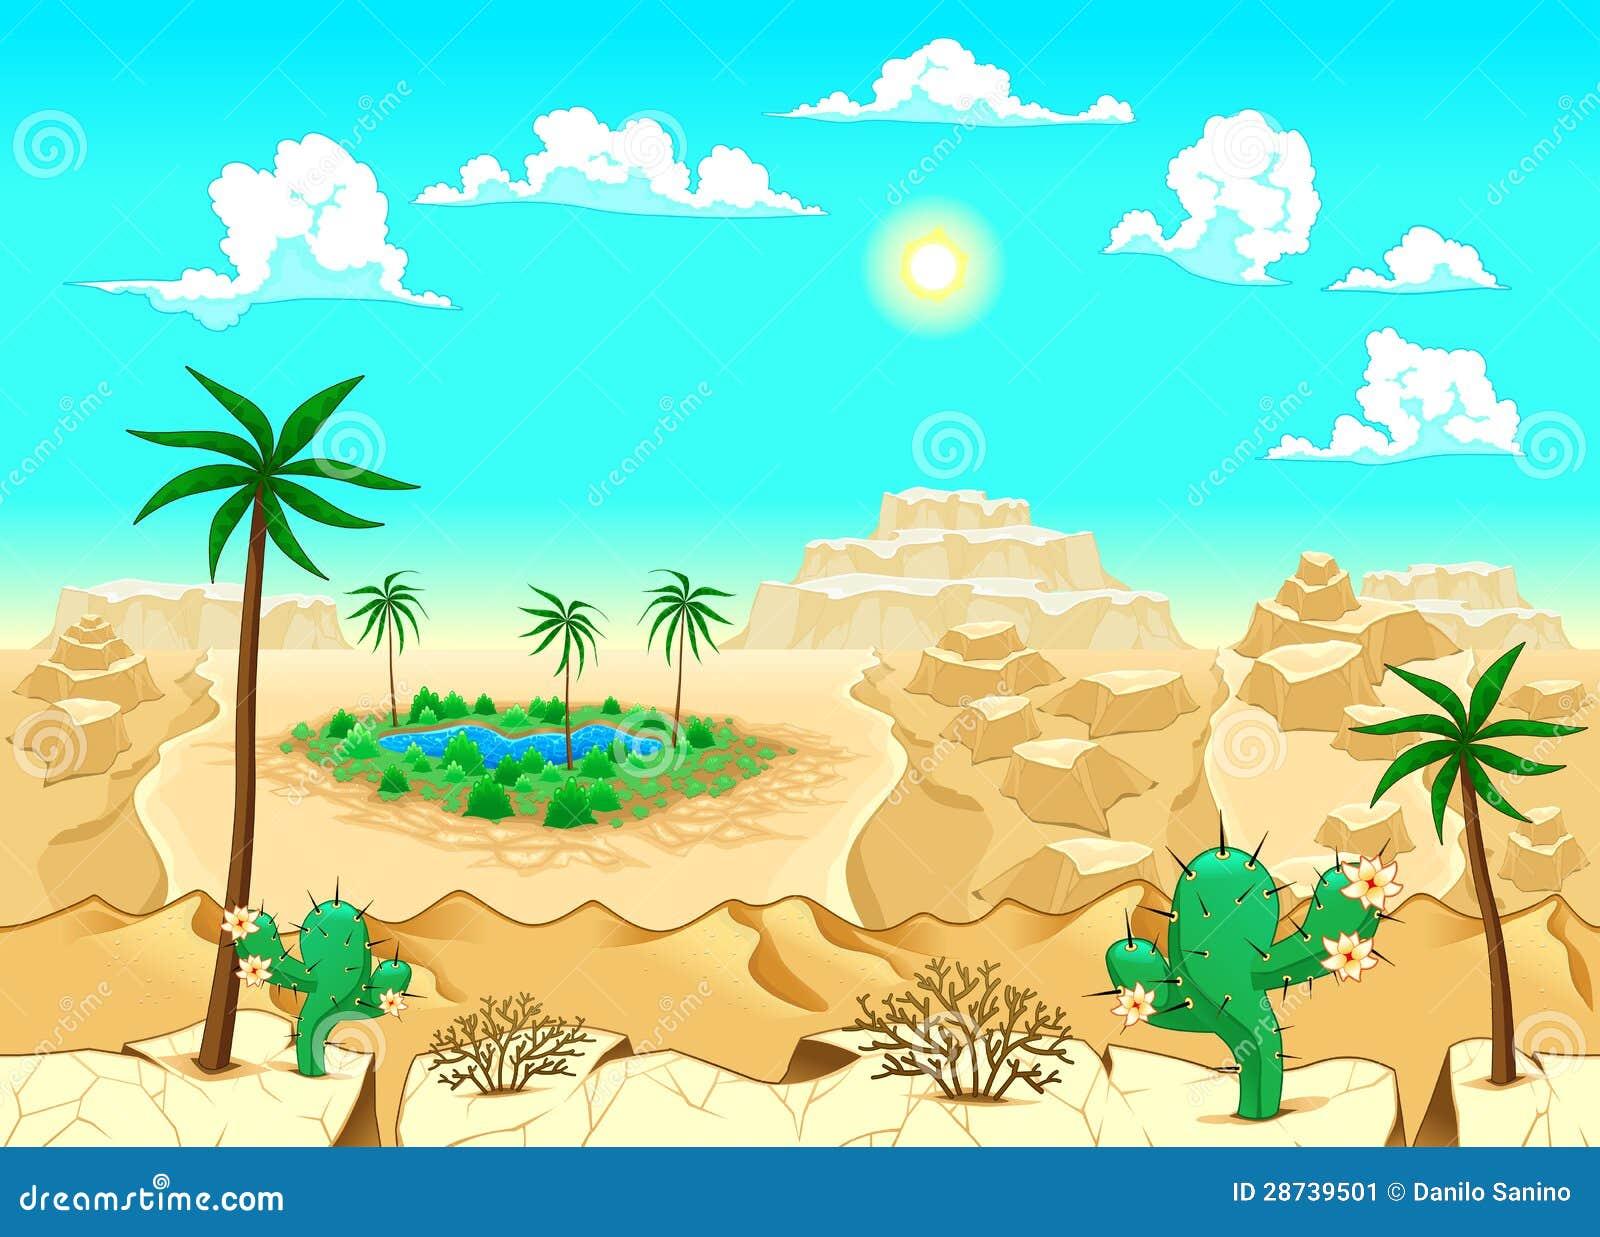 desert oasis drawing - photo #33